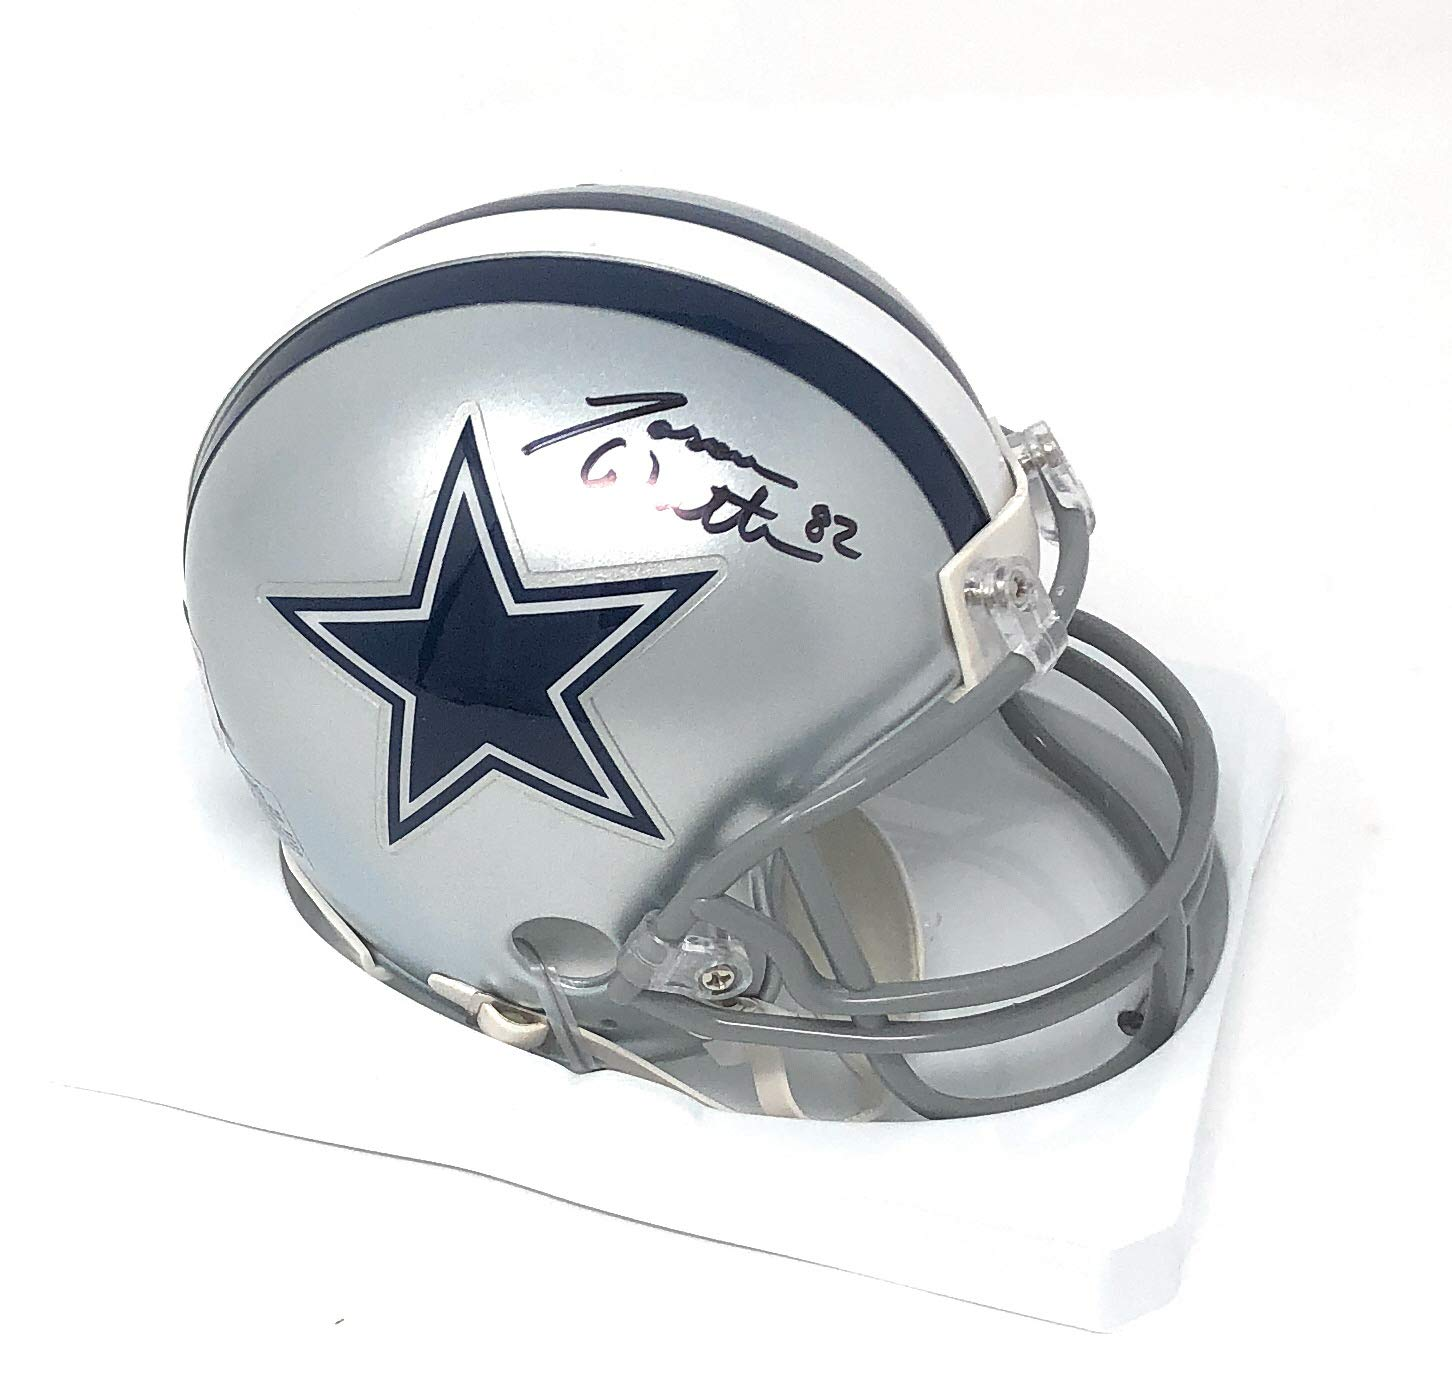 Jason Witten Dallas Cowboys Signed Autograph Mini Helmet Witten 82 Player Hologram